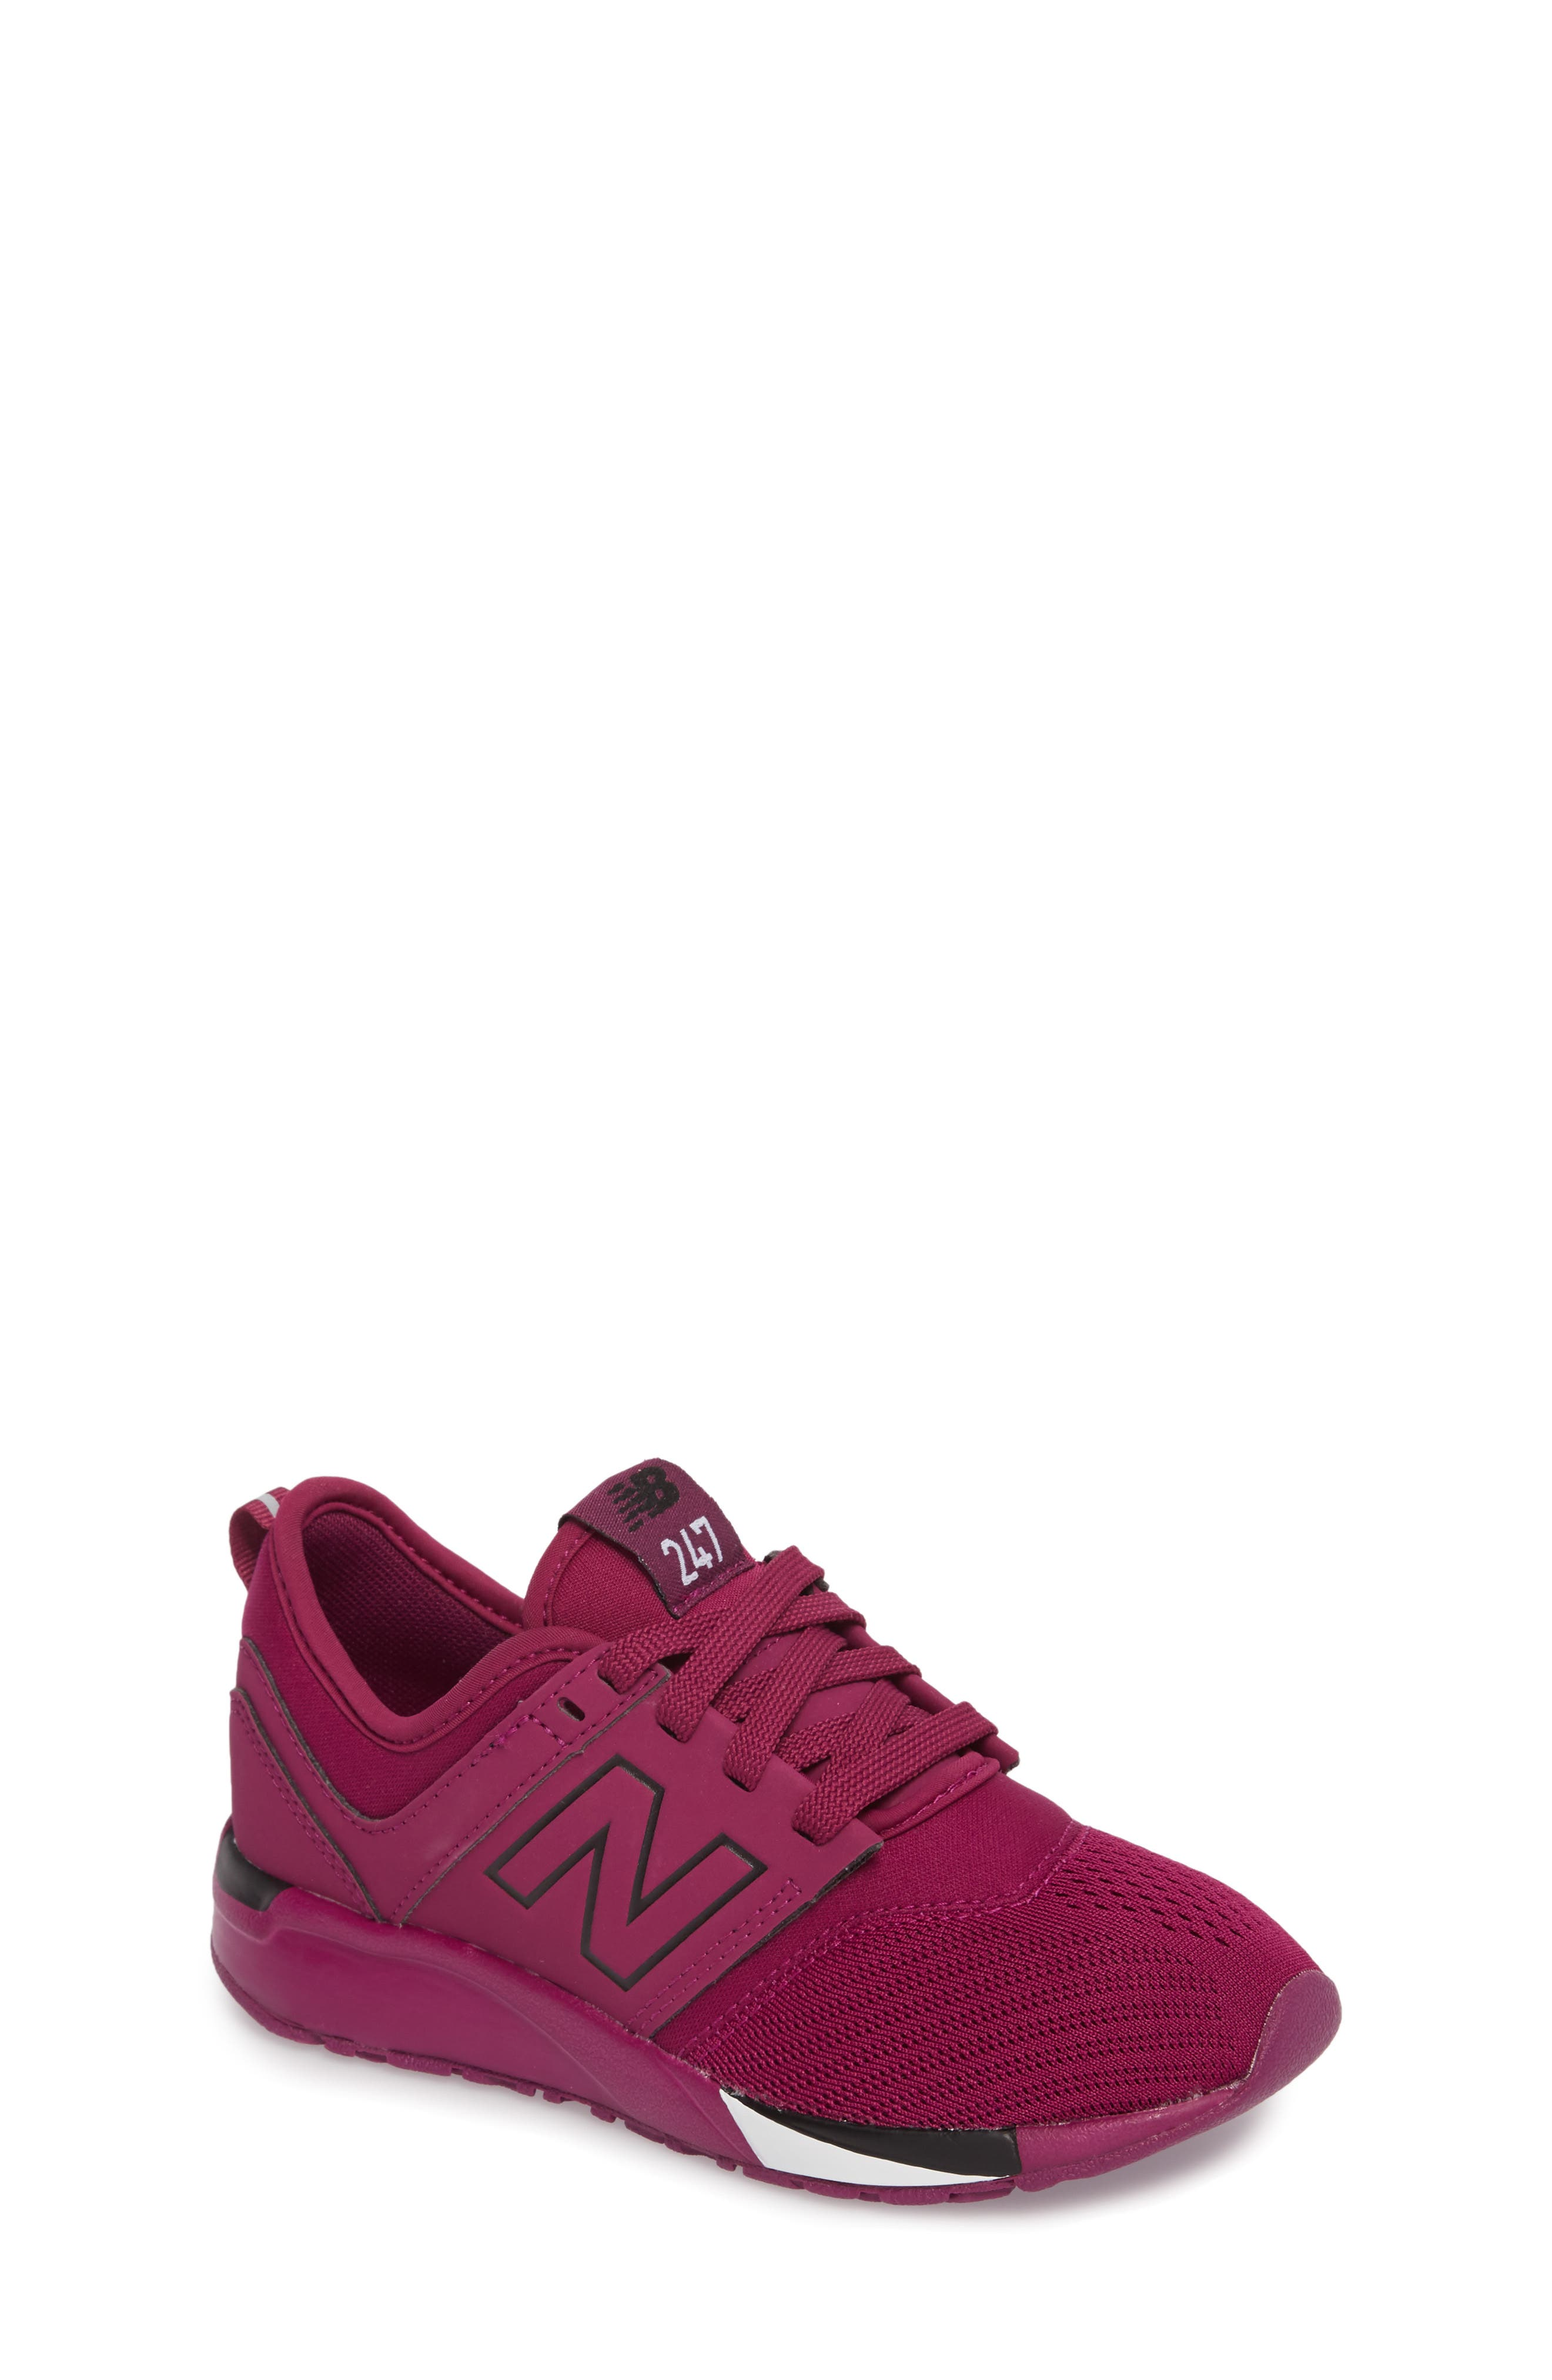 247 Sport Sneaker,                         Main,                         color, Red/ Black